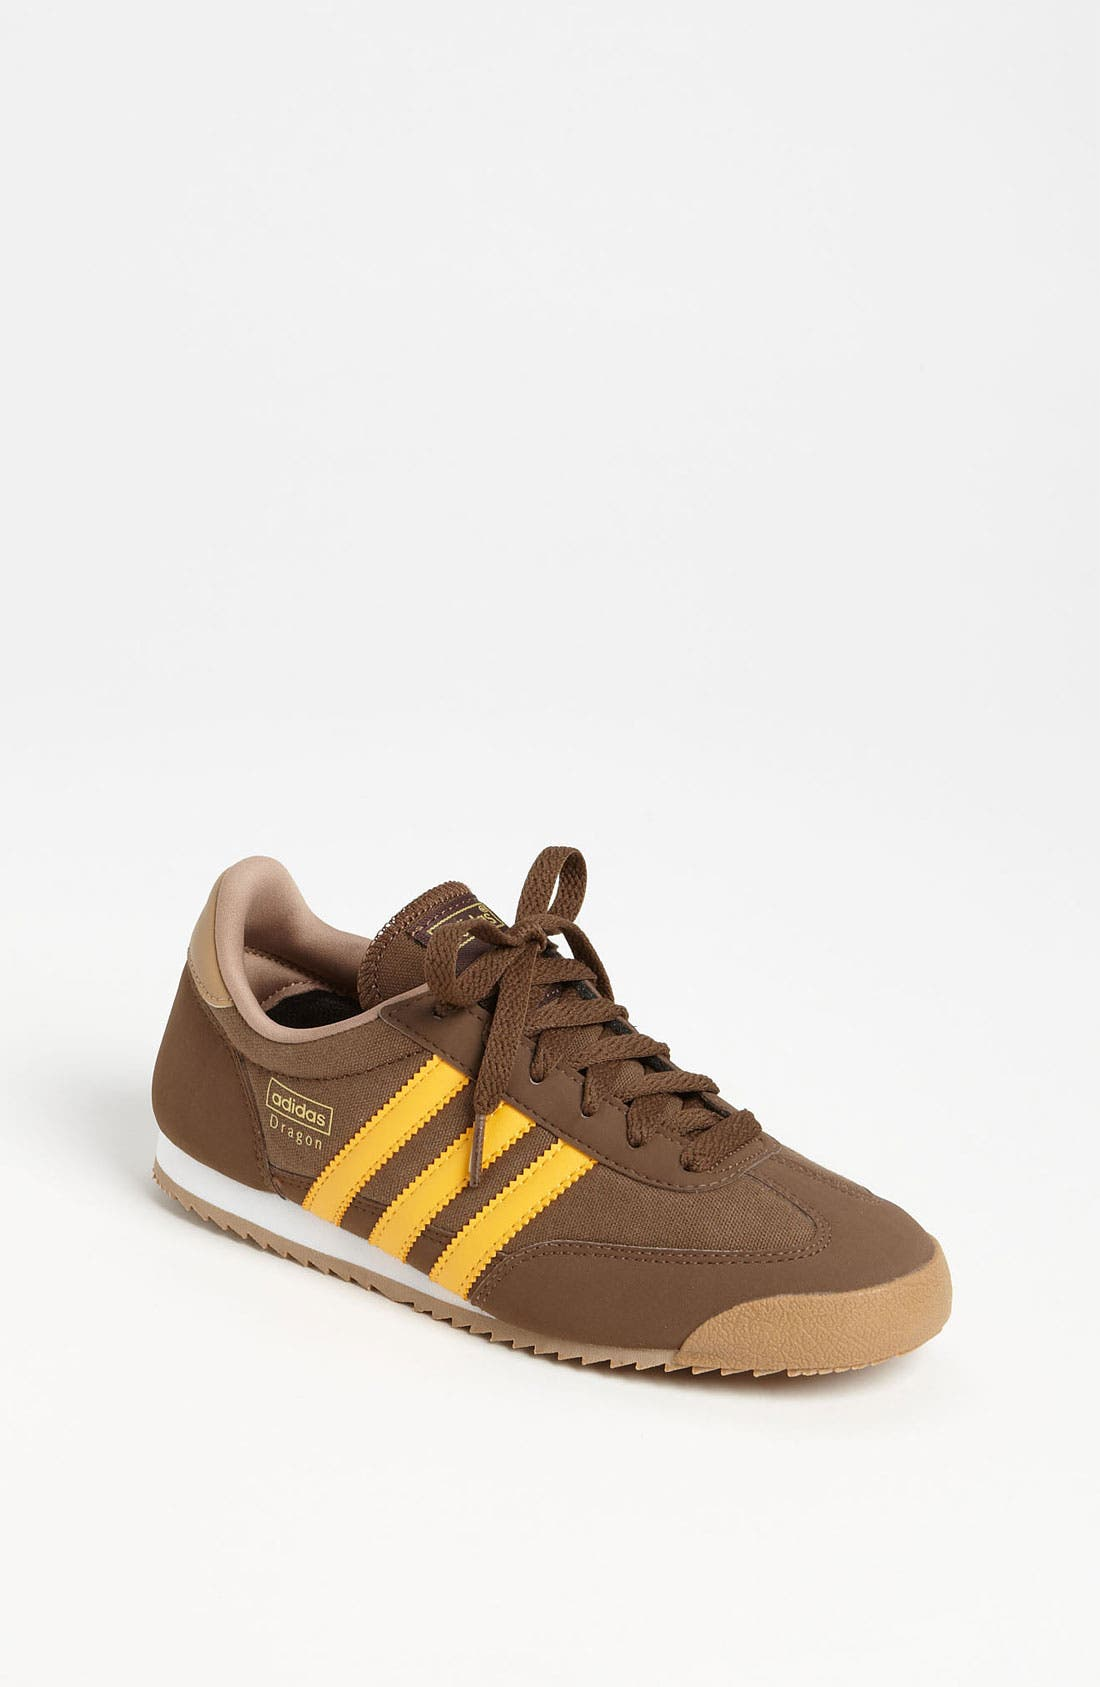 Alternate Image 1 Selected - adidas 'Dragon' Sneaker (Big Kid)